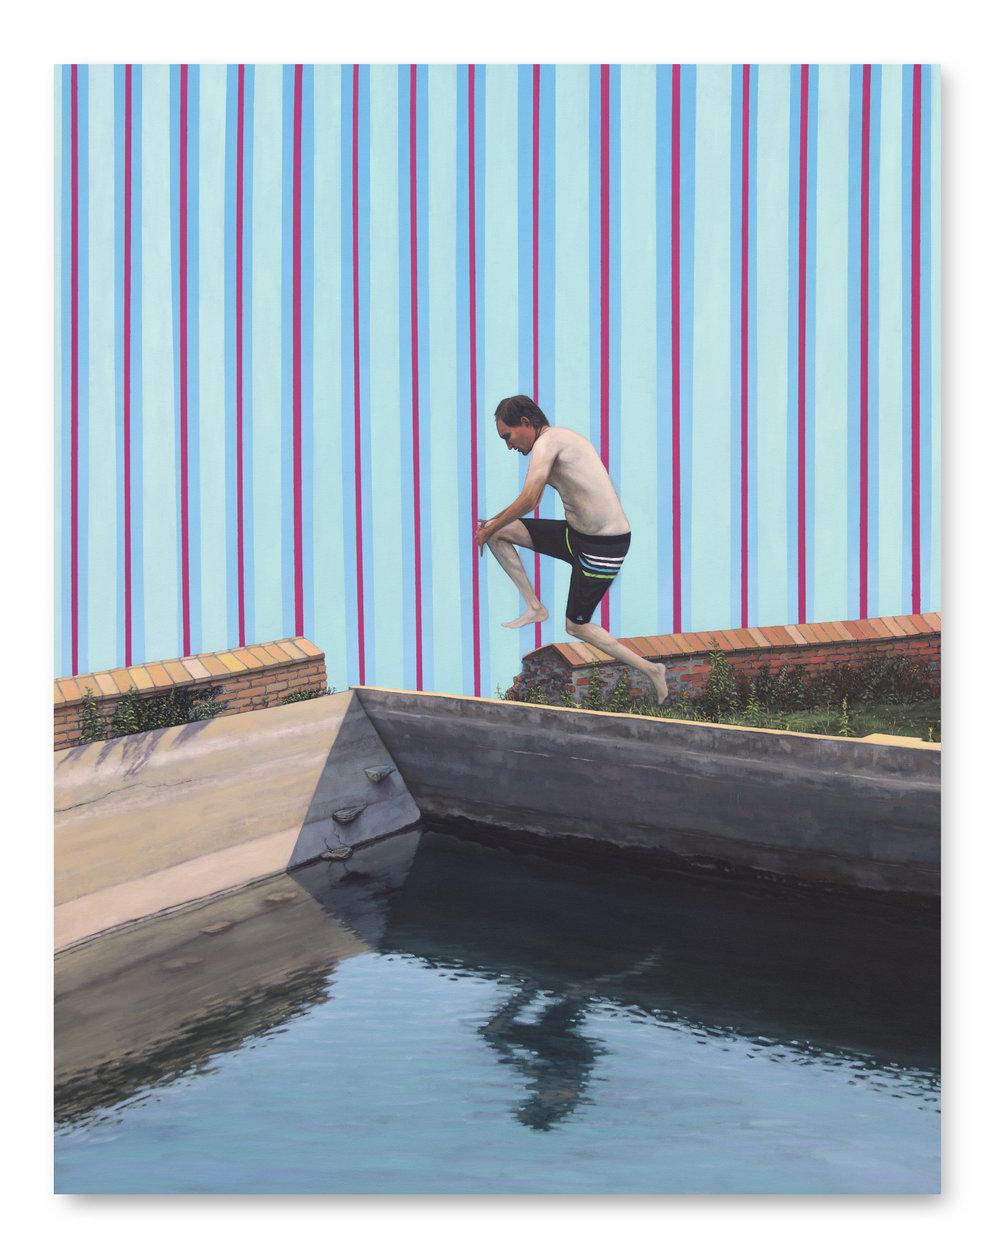 El Refugio ,  2016, Oil on canvas, 140 x 110 cm